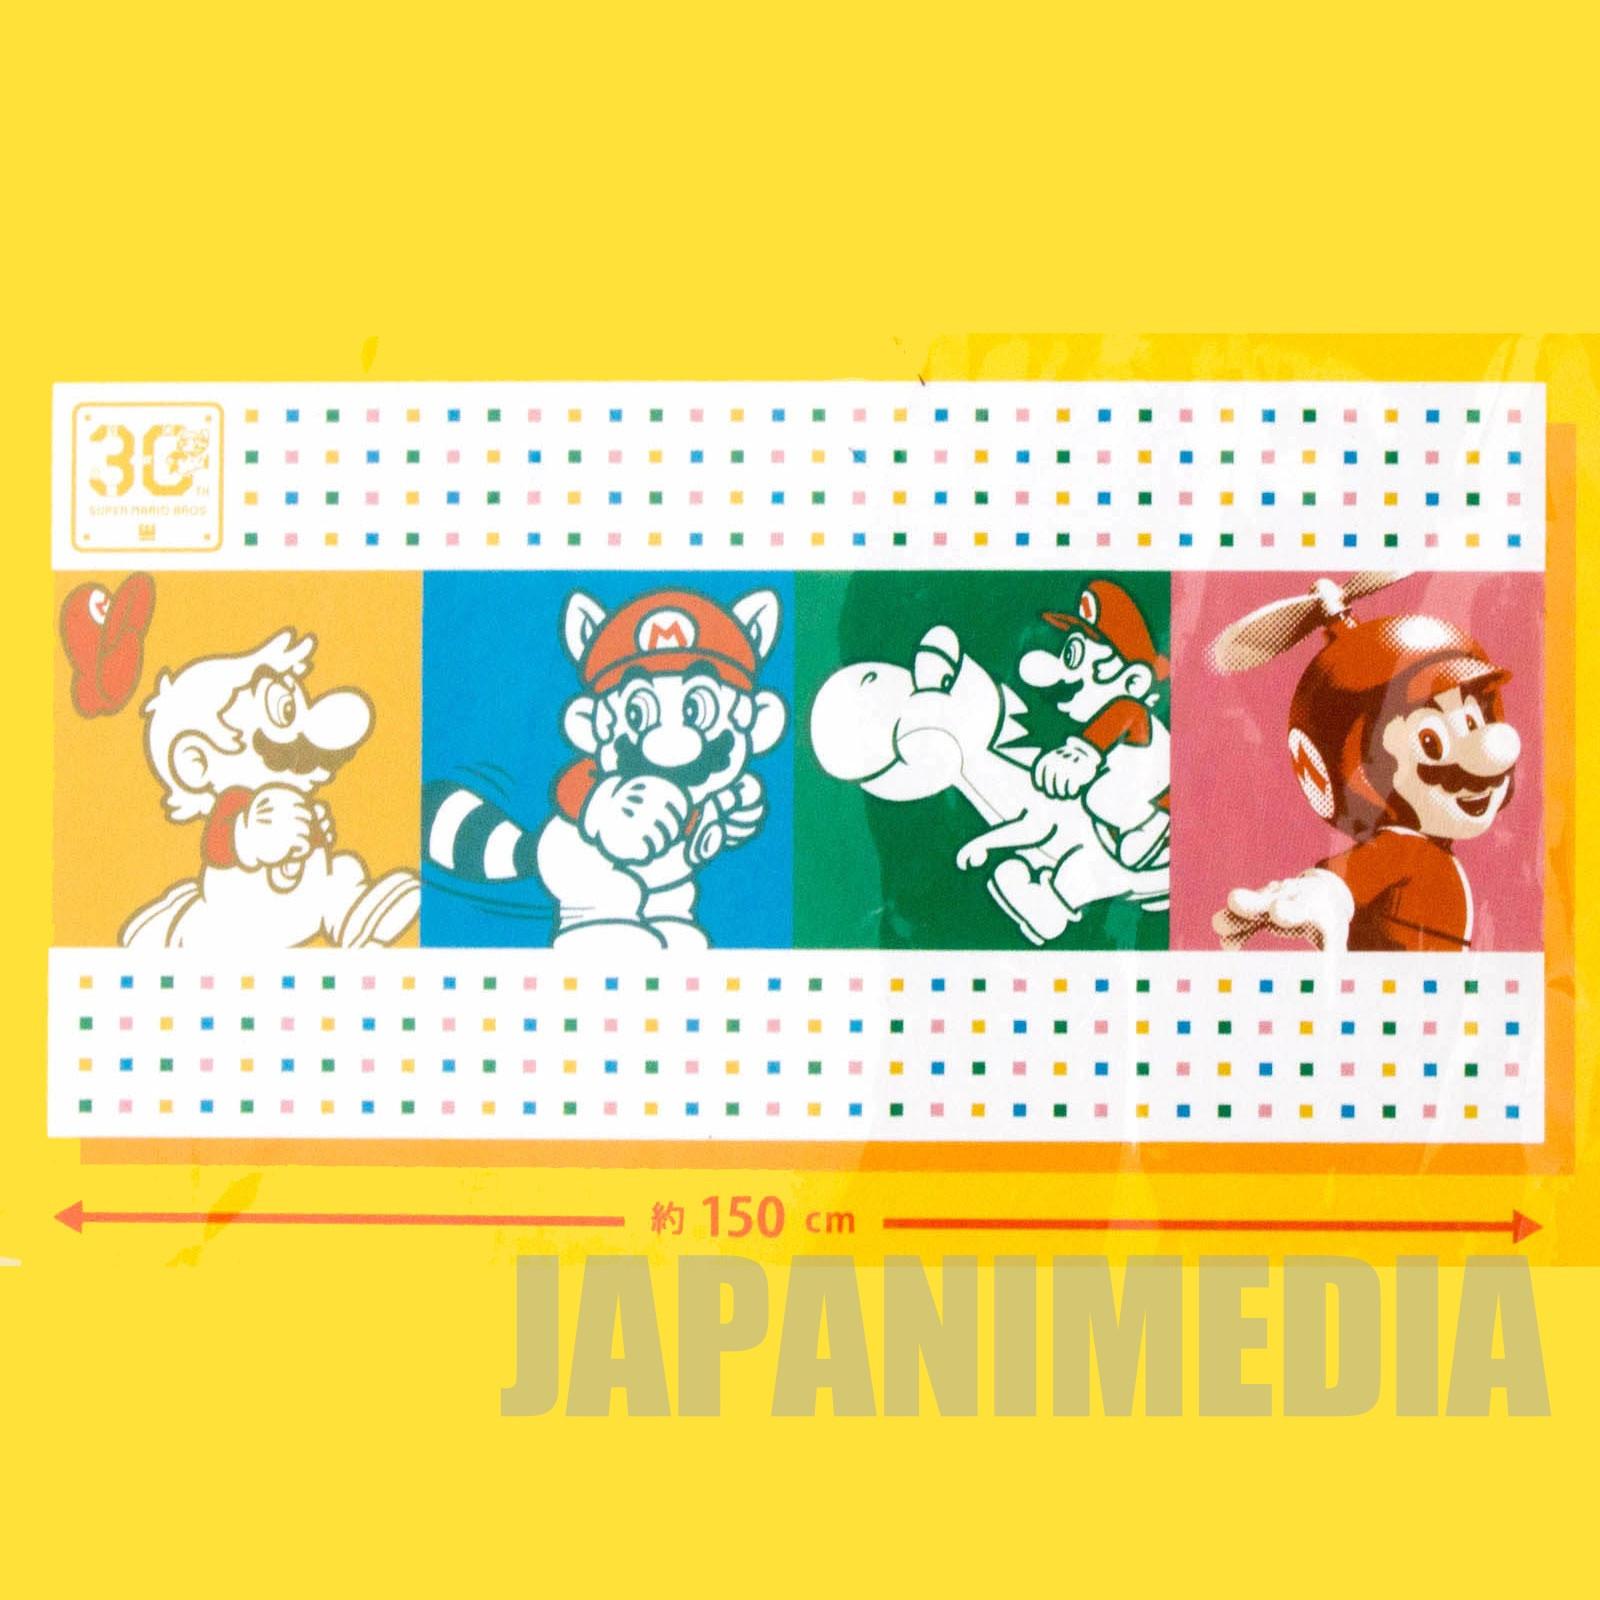 Super Mario 30th Anniversary Big size Towel (150cm) JAPAN FAMICOM NES